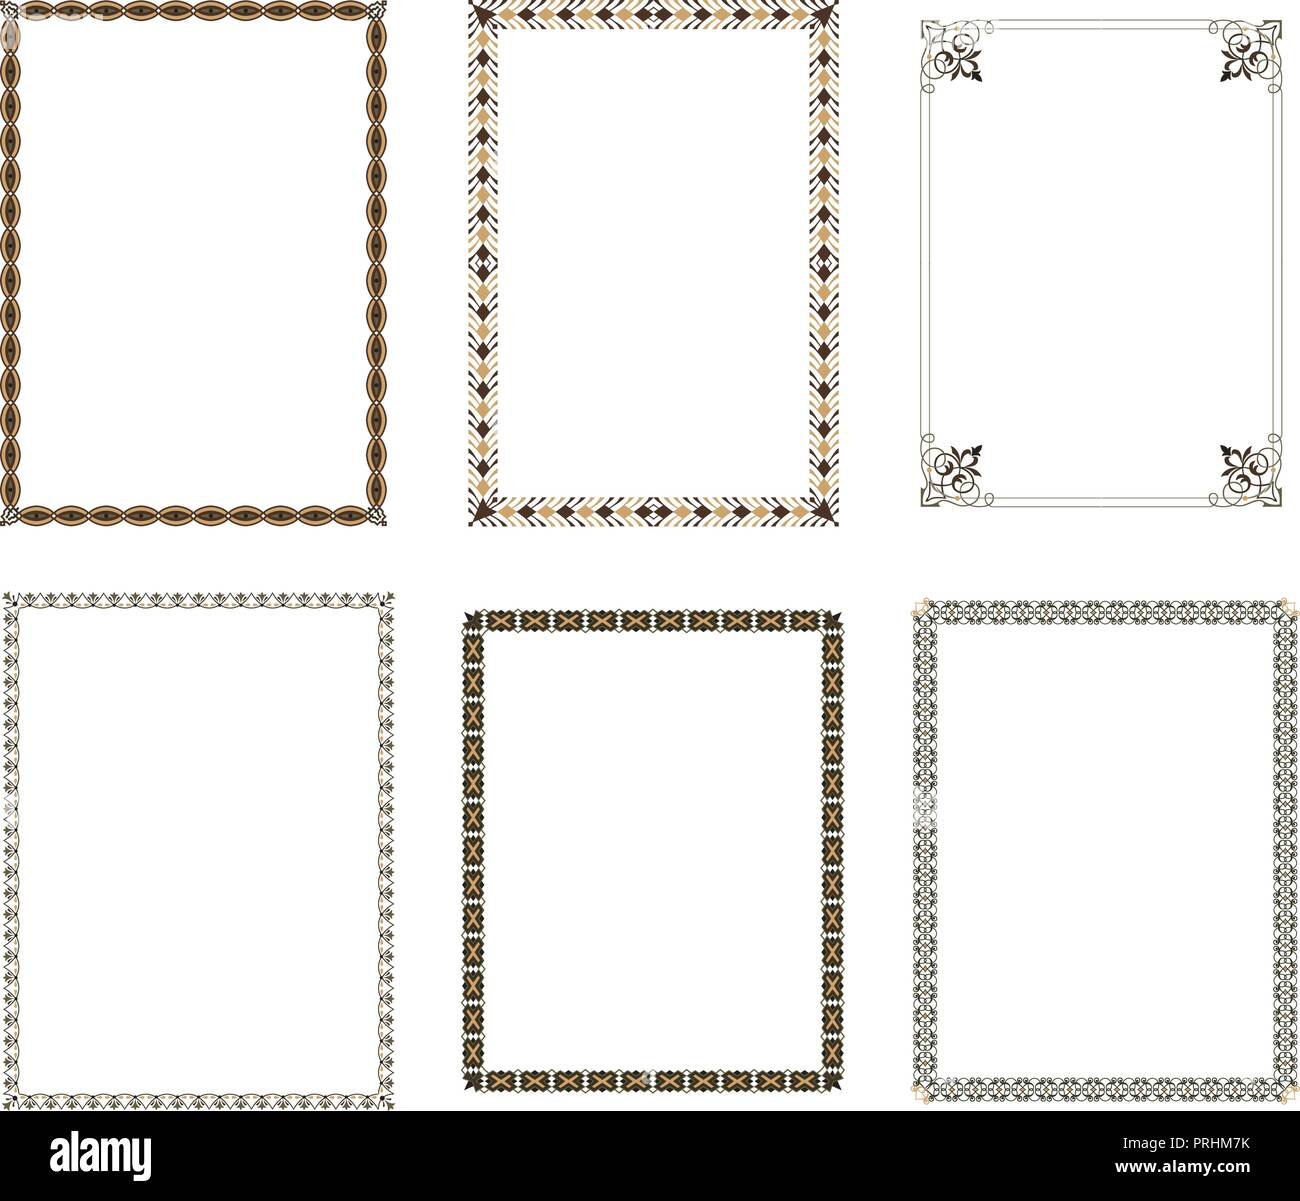 Vector Decorative Frame Elegant Element For Design Template Place